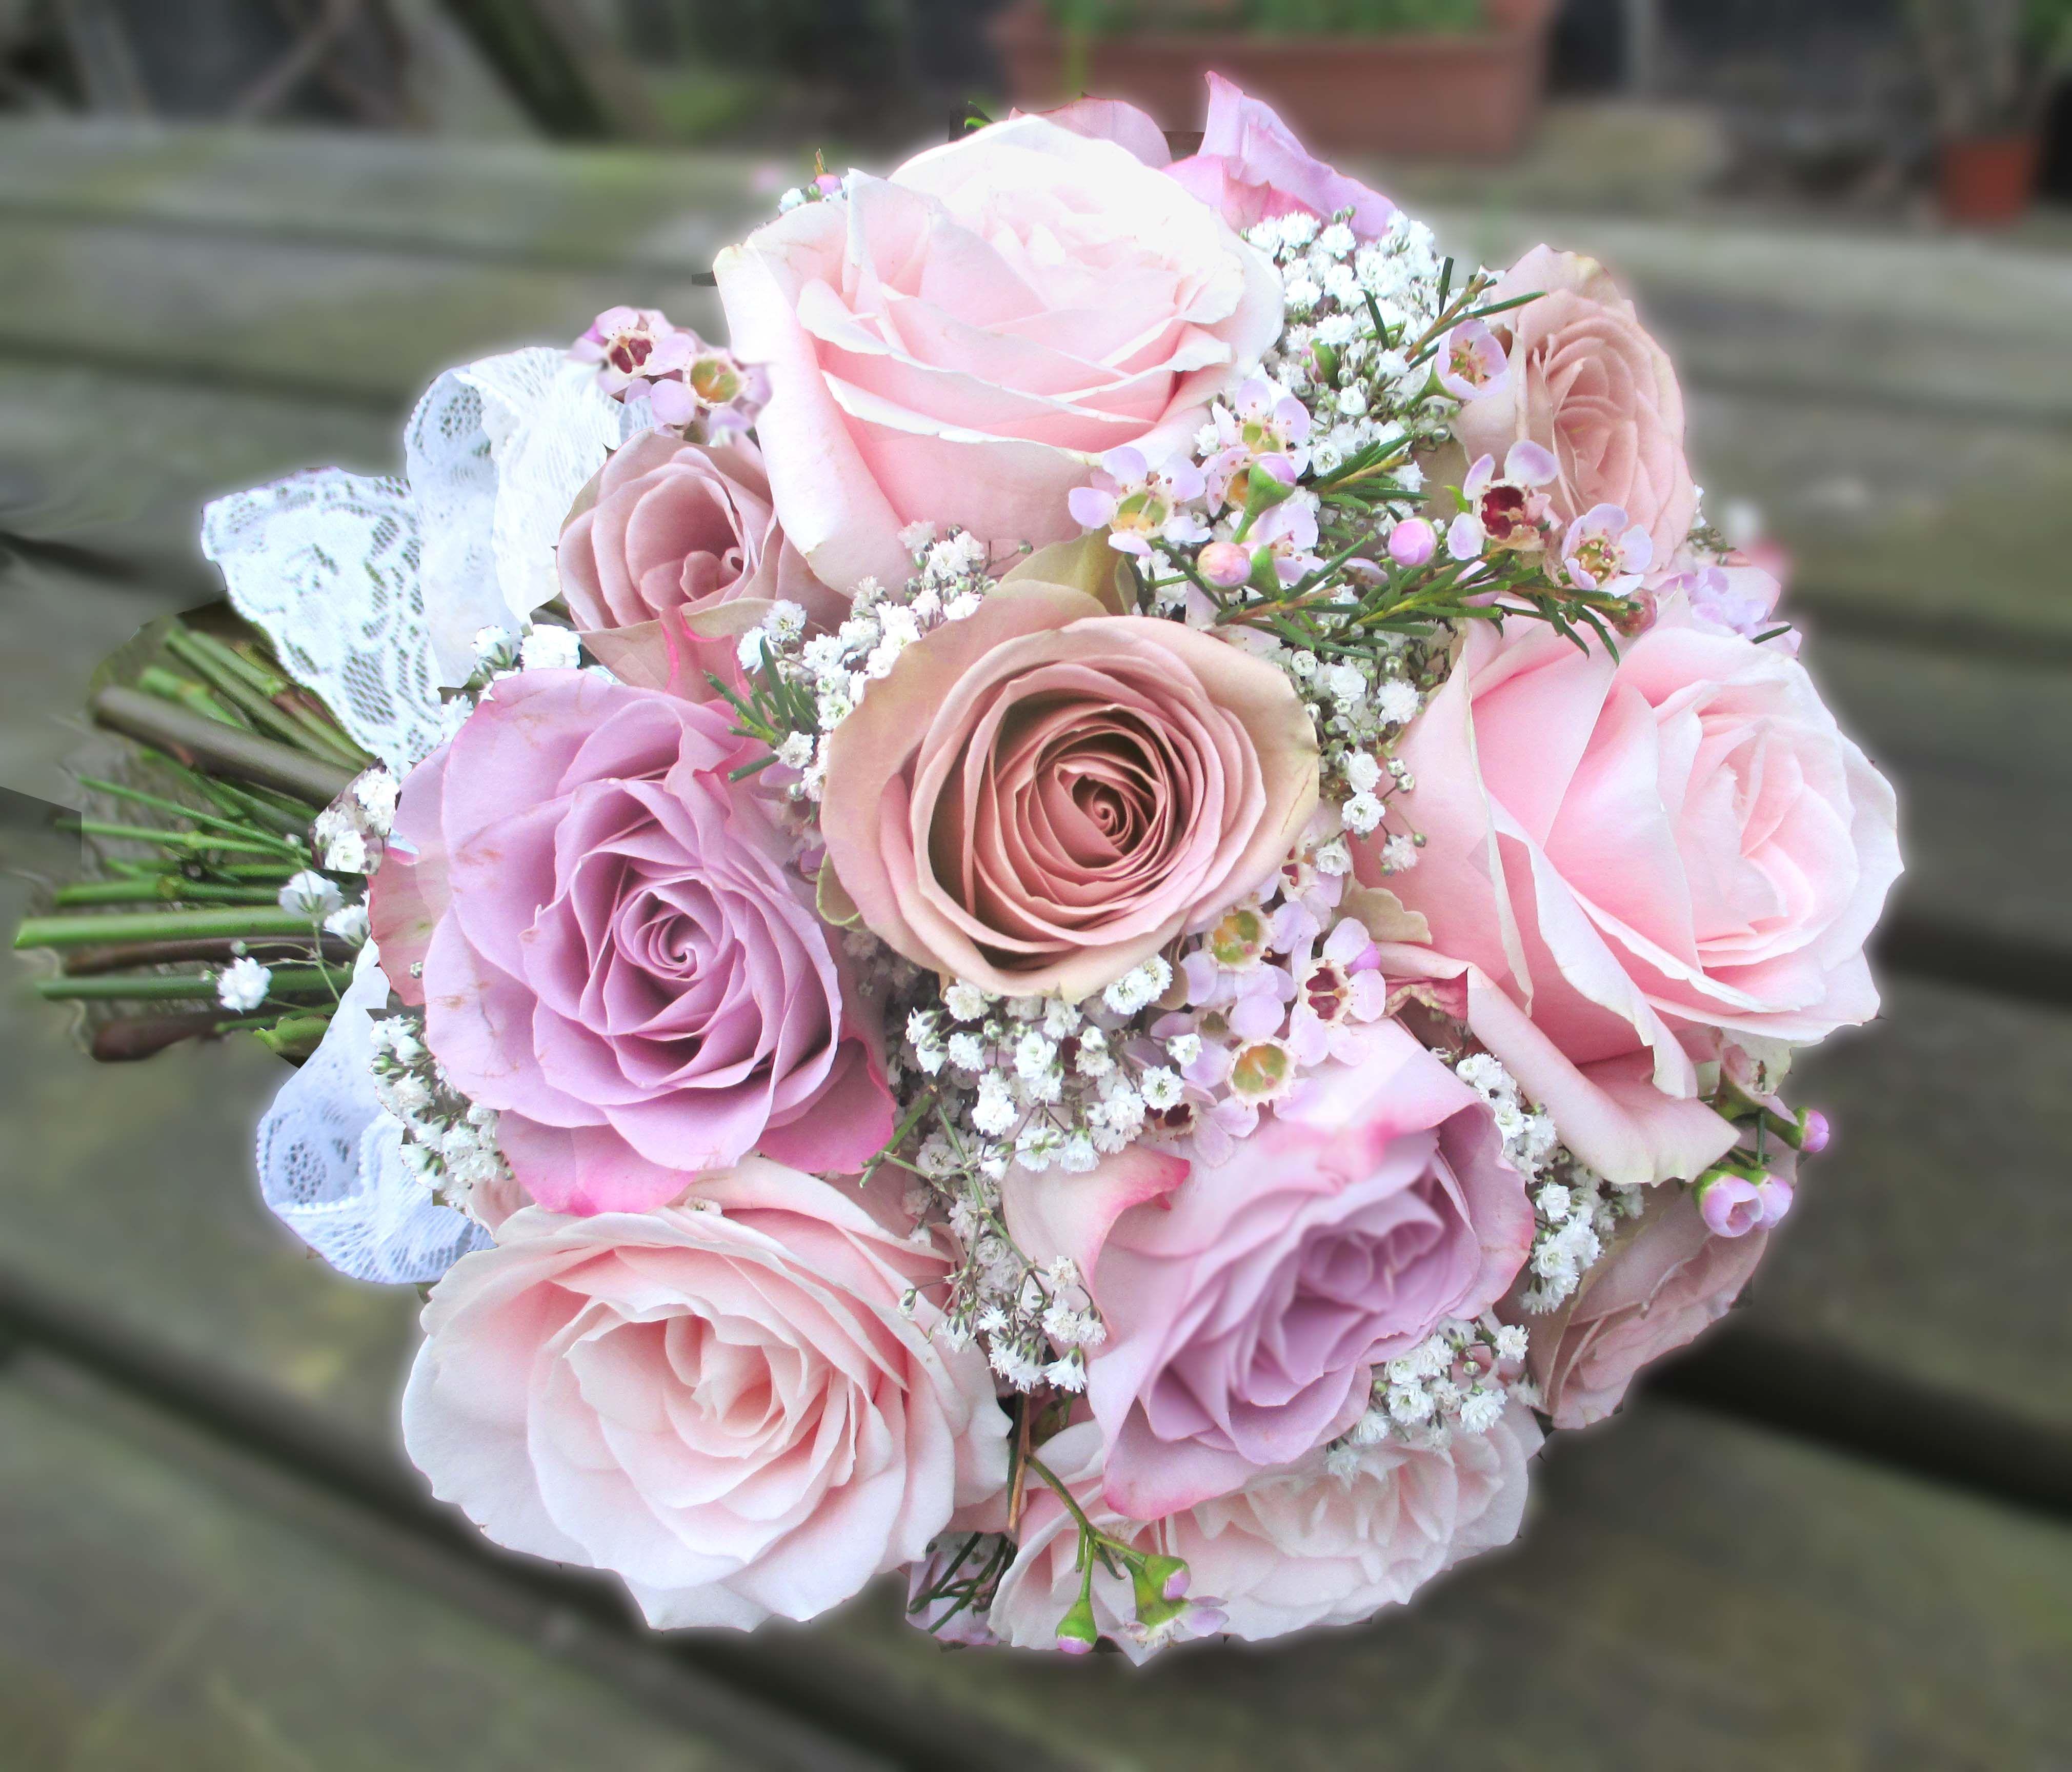 Rose And Gypsophila Bridal Bouquet Wedding Flowers Leeds Florist Designer Yorkshire